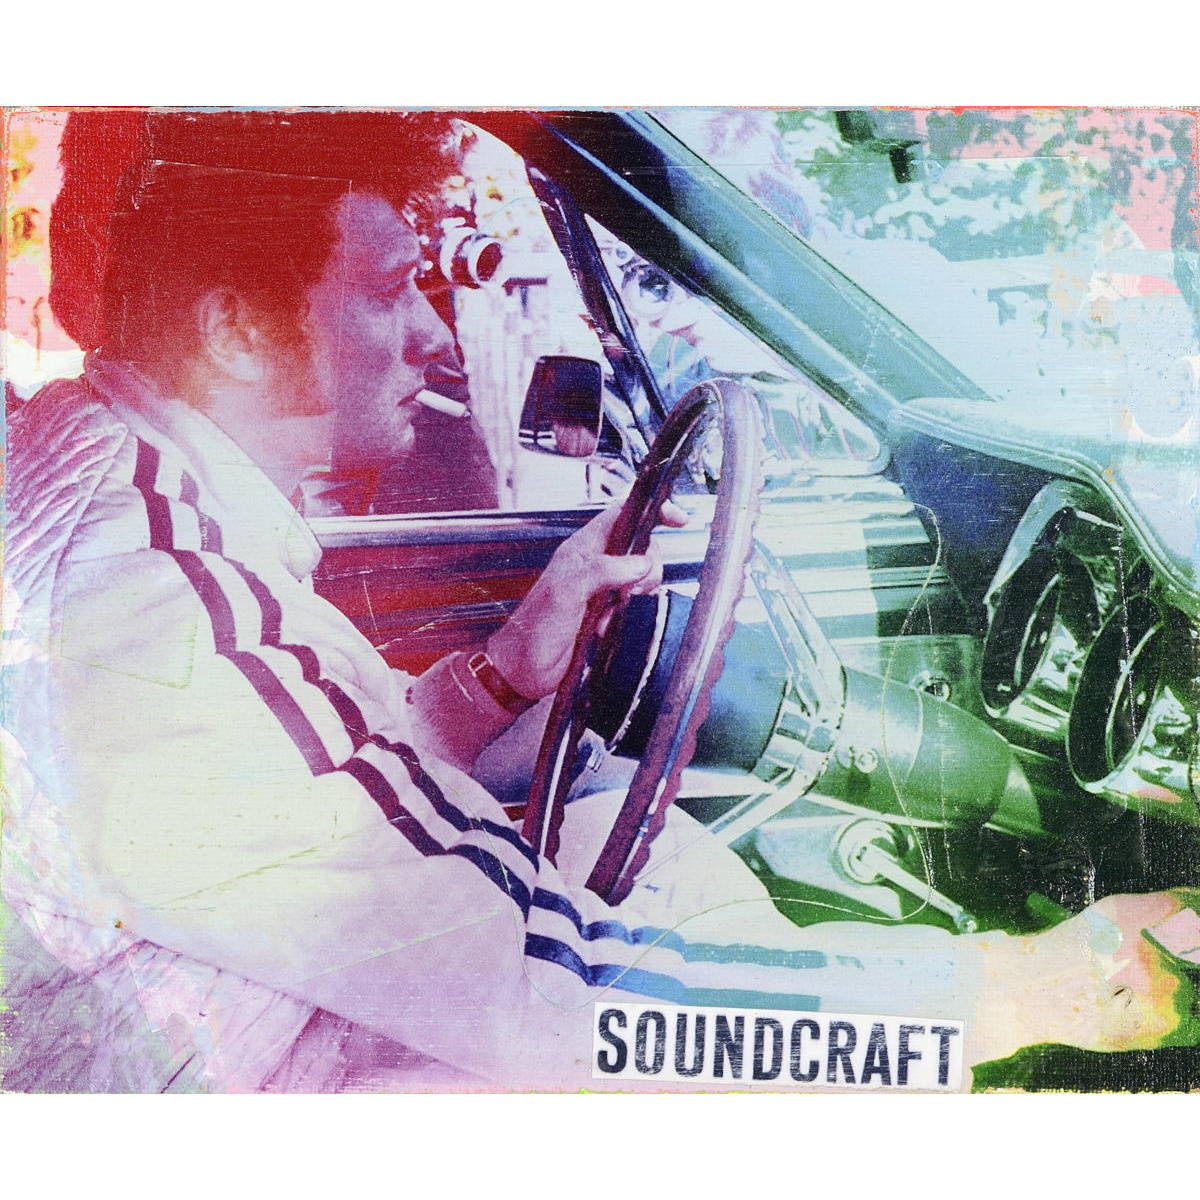 Soundcraft von Jörg Döring